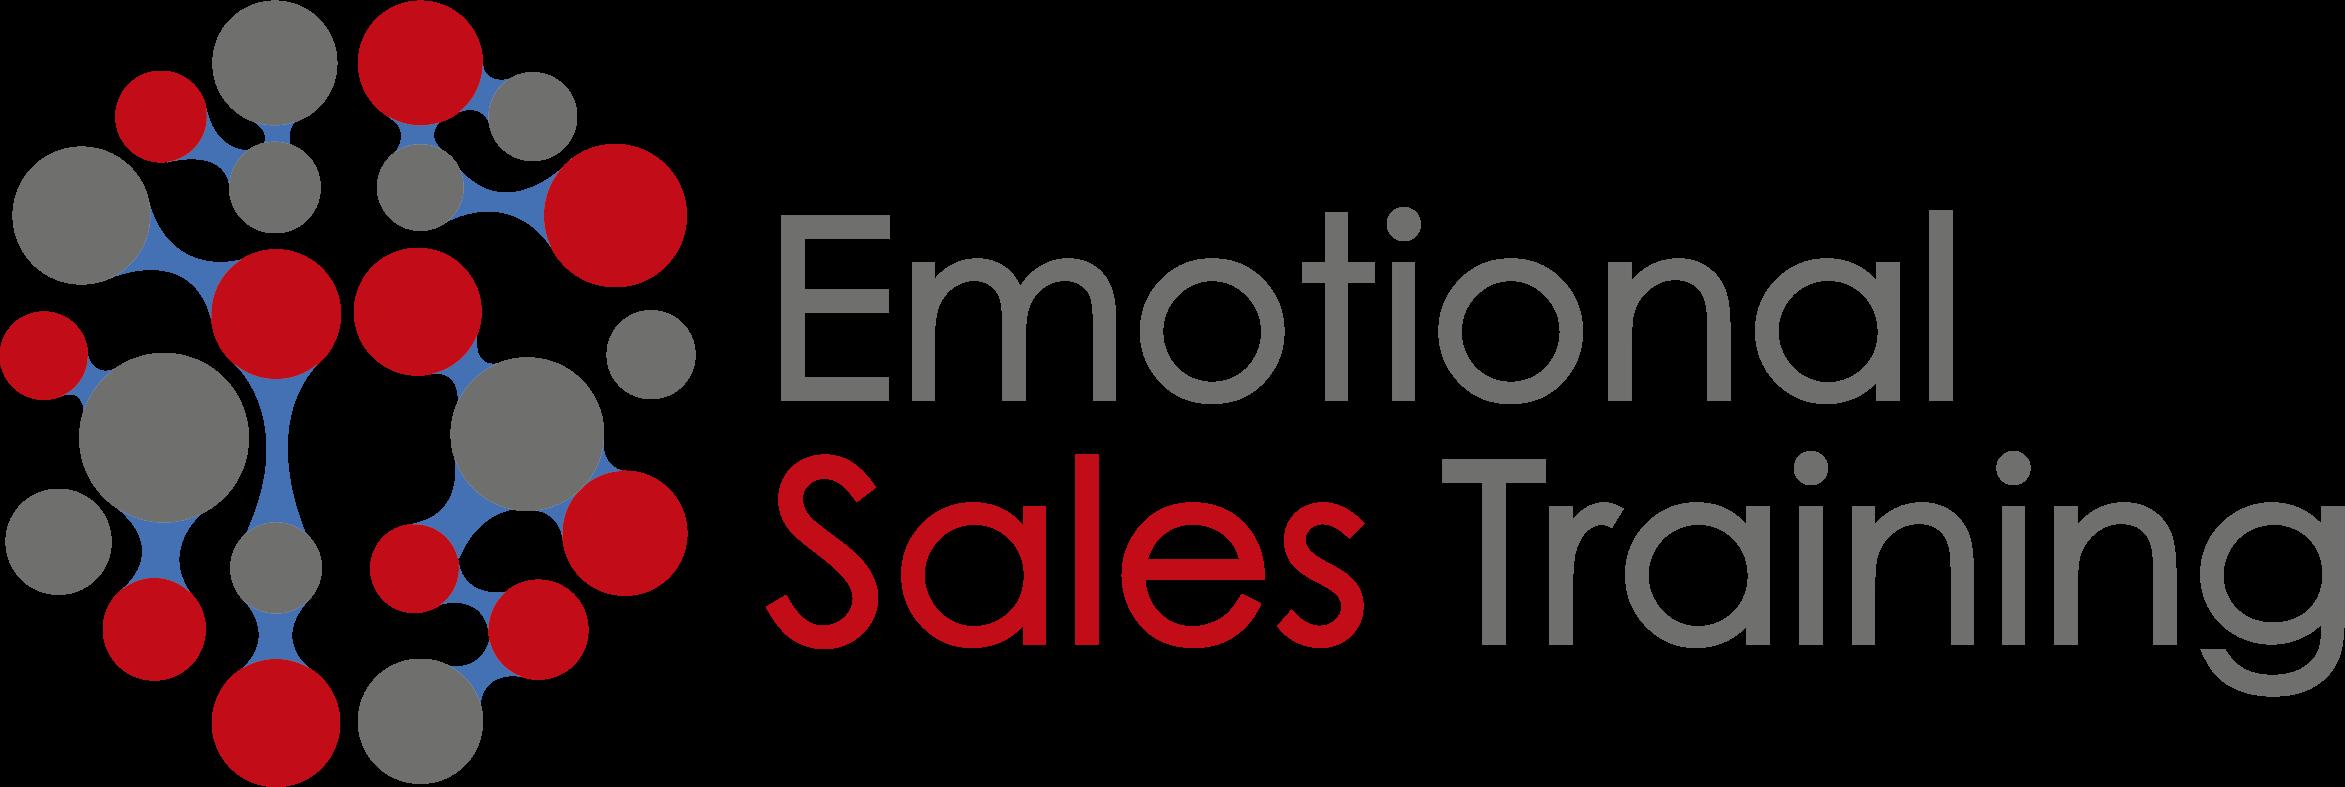 Emotional Sales Training